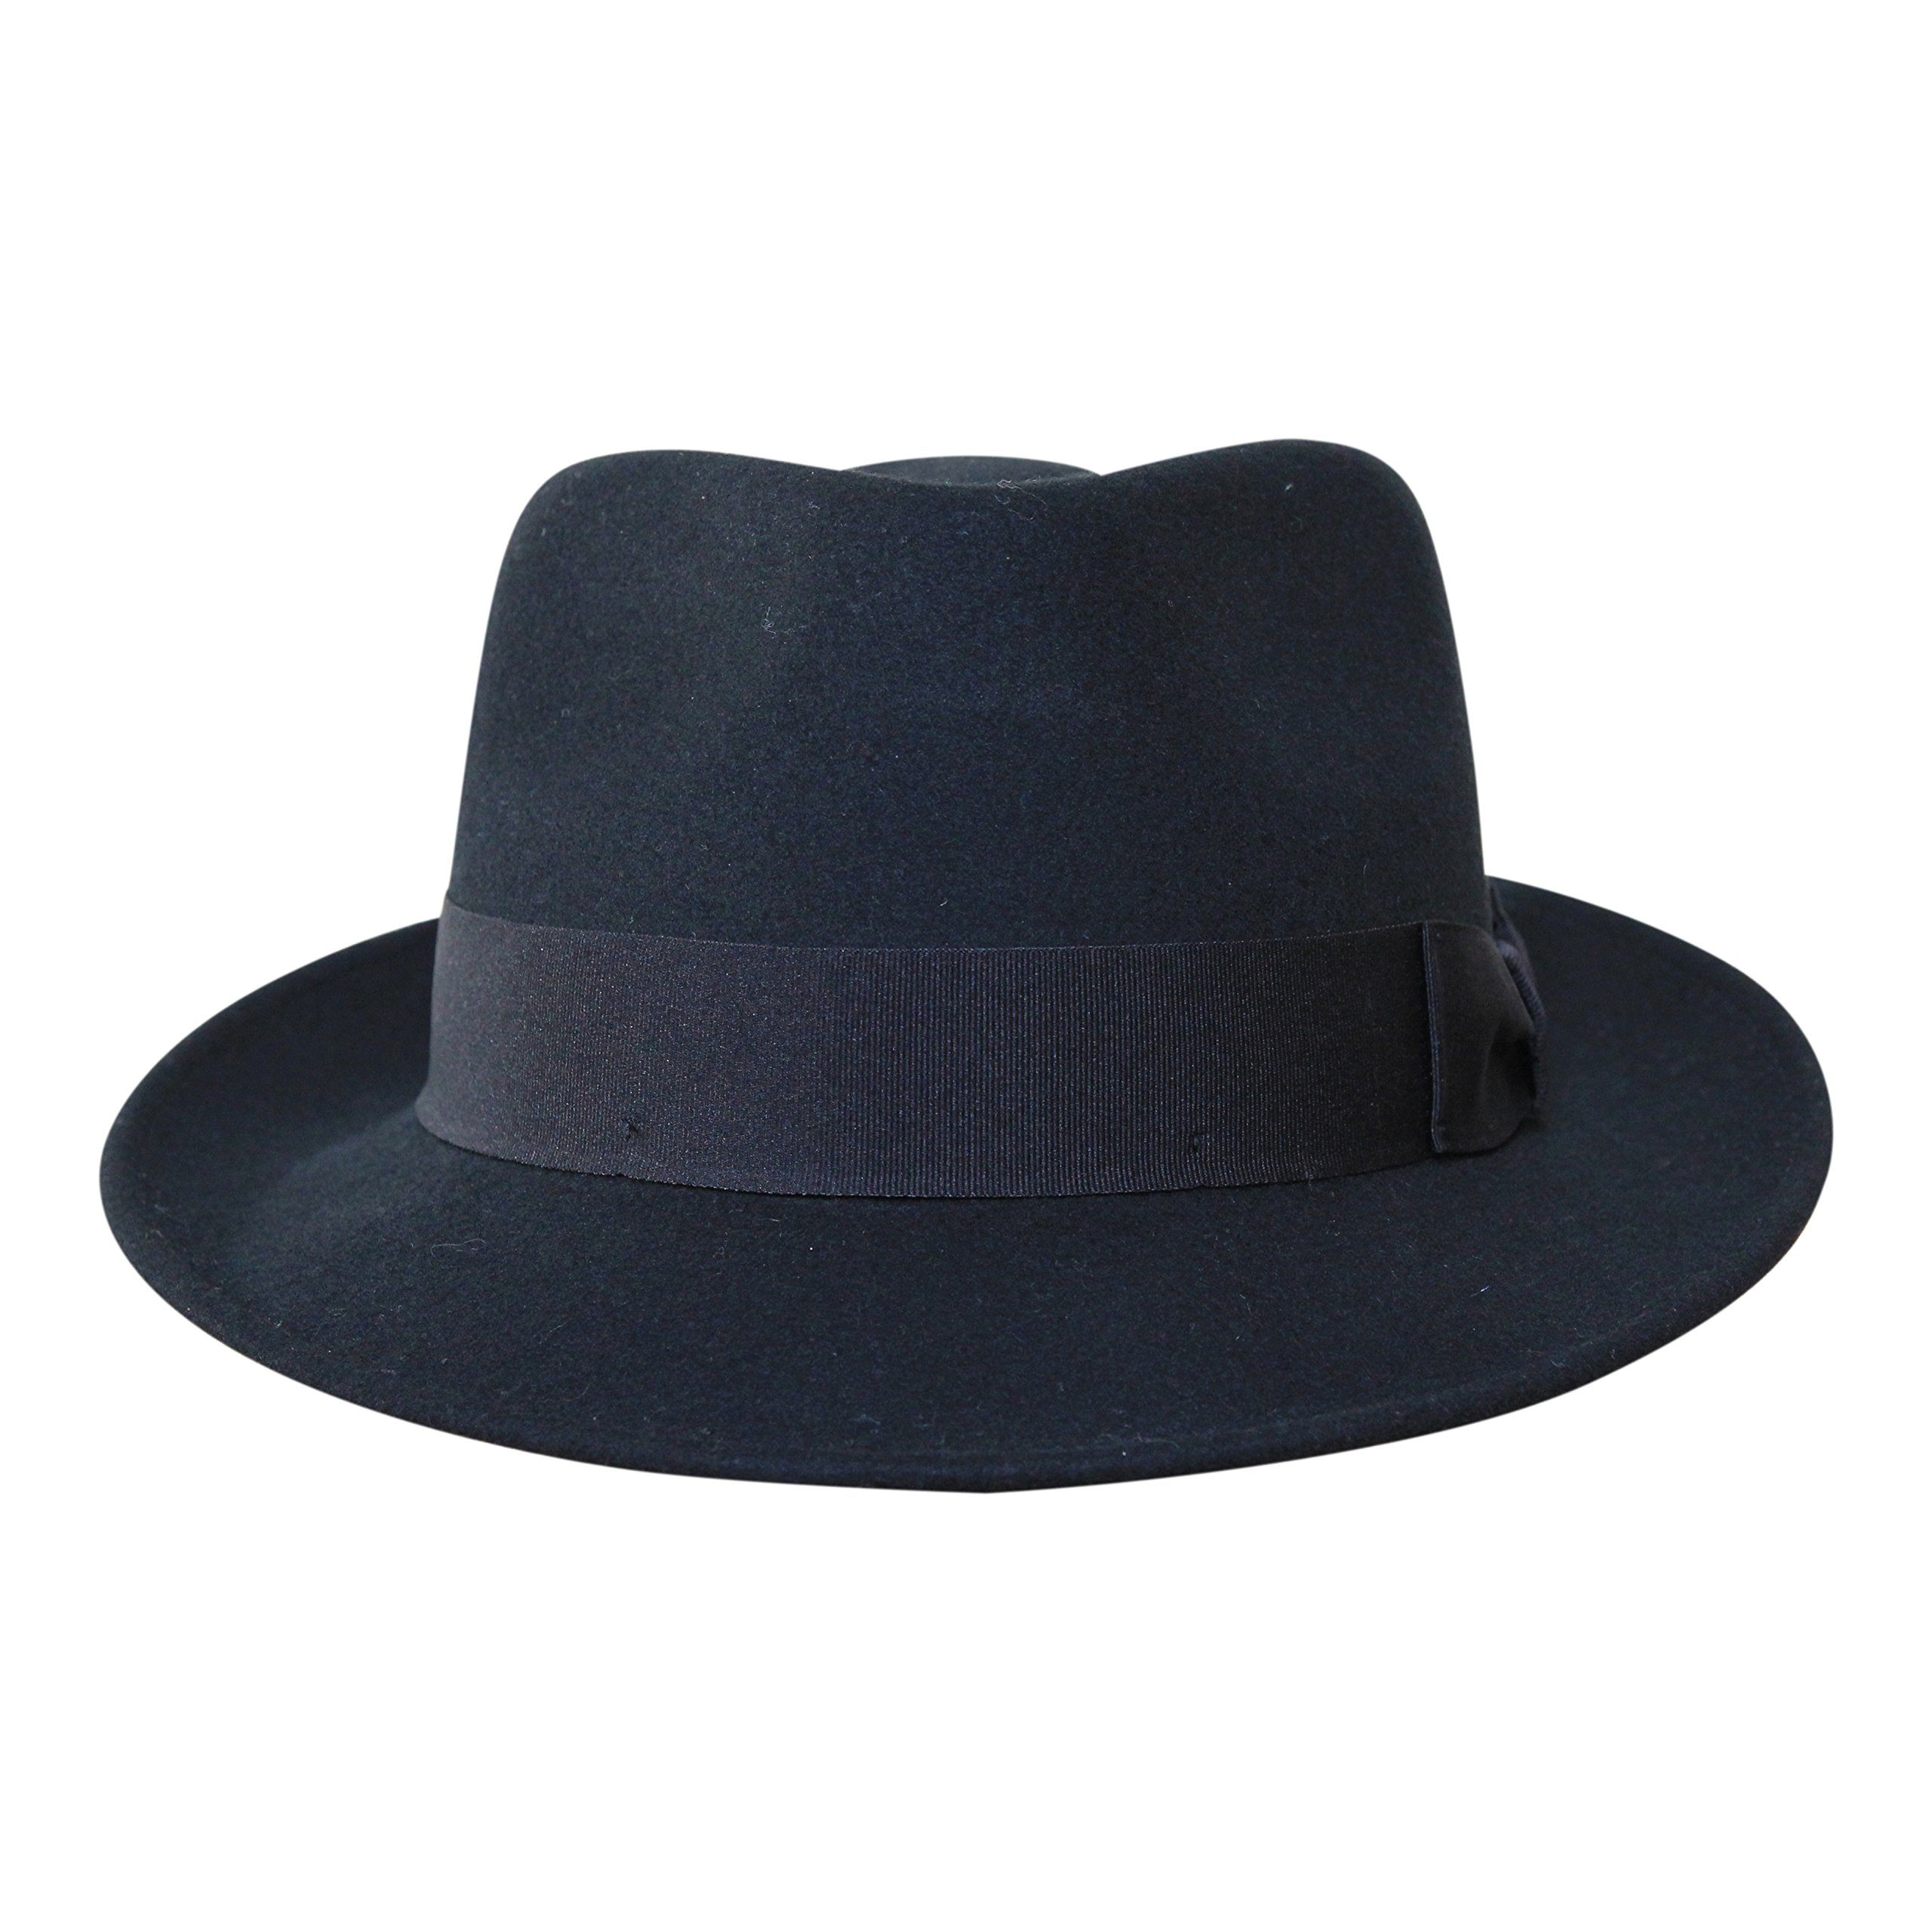 B&S Premium Doyle - Teardrop Fedora Hat - 100% Wool Felt - Crushable For Travel - Water Resistant - Unisex - Black 58